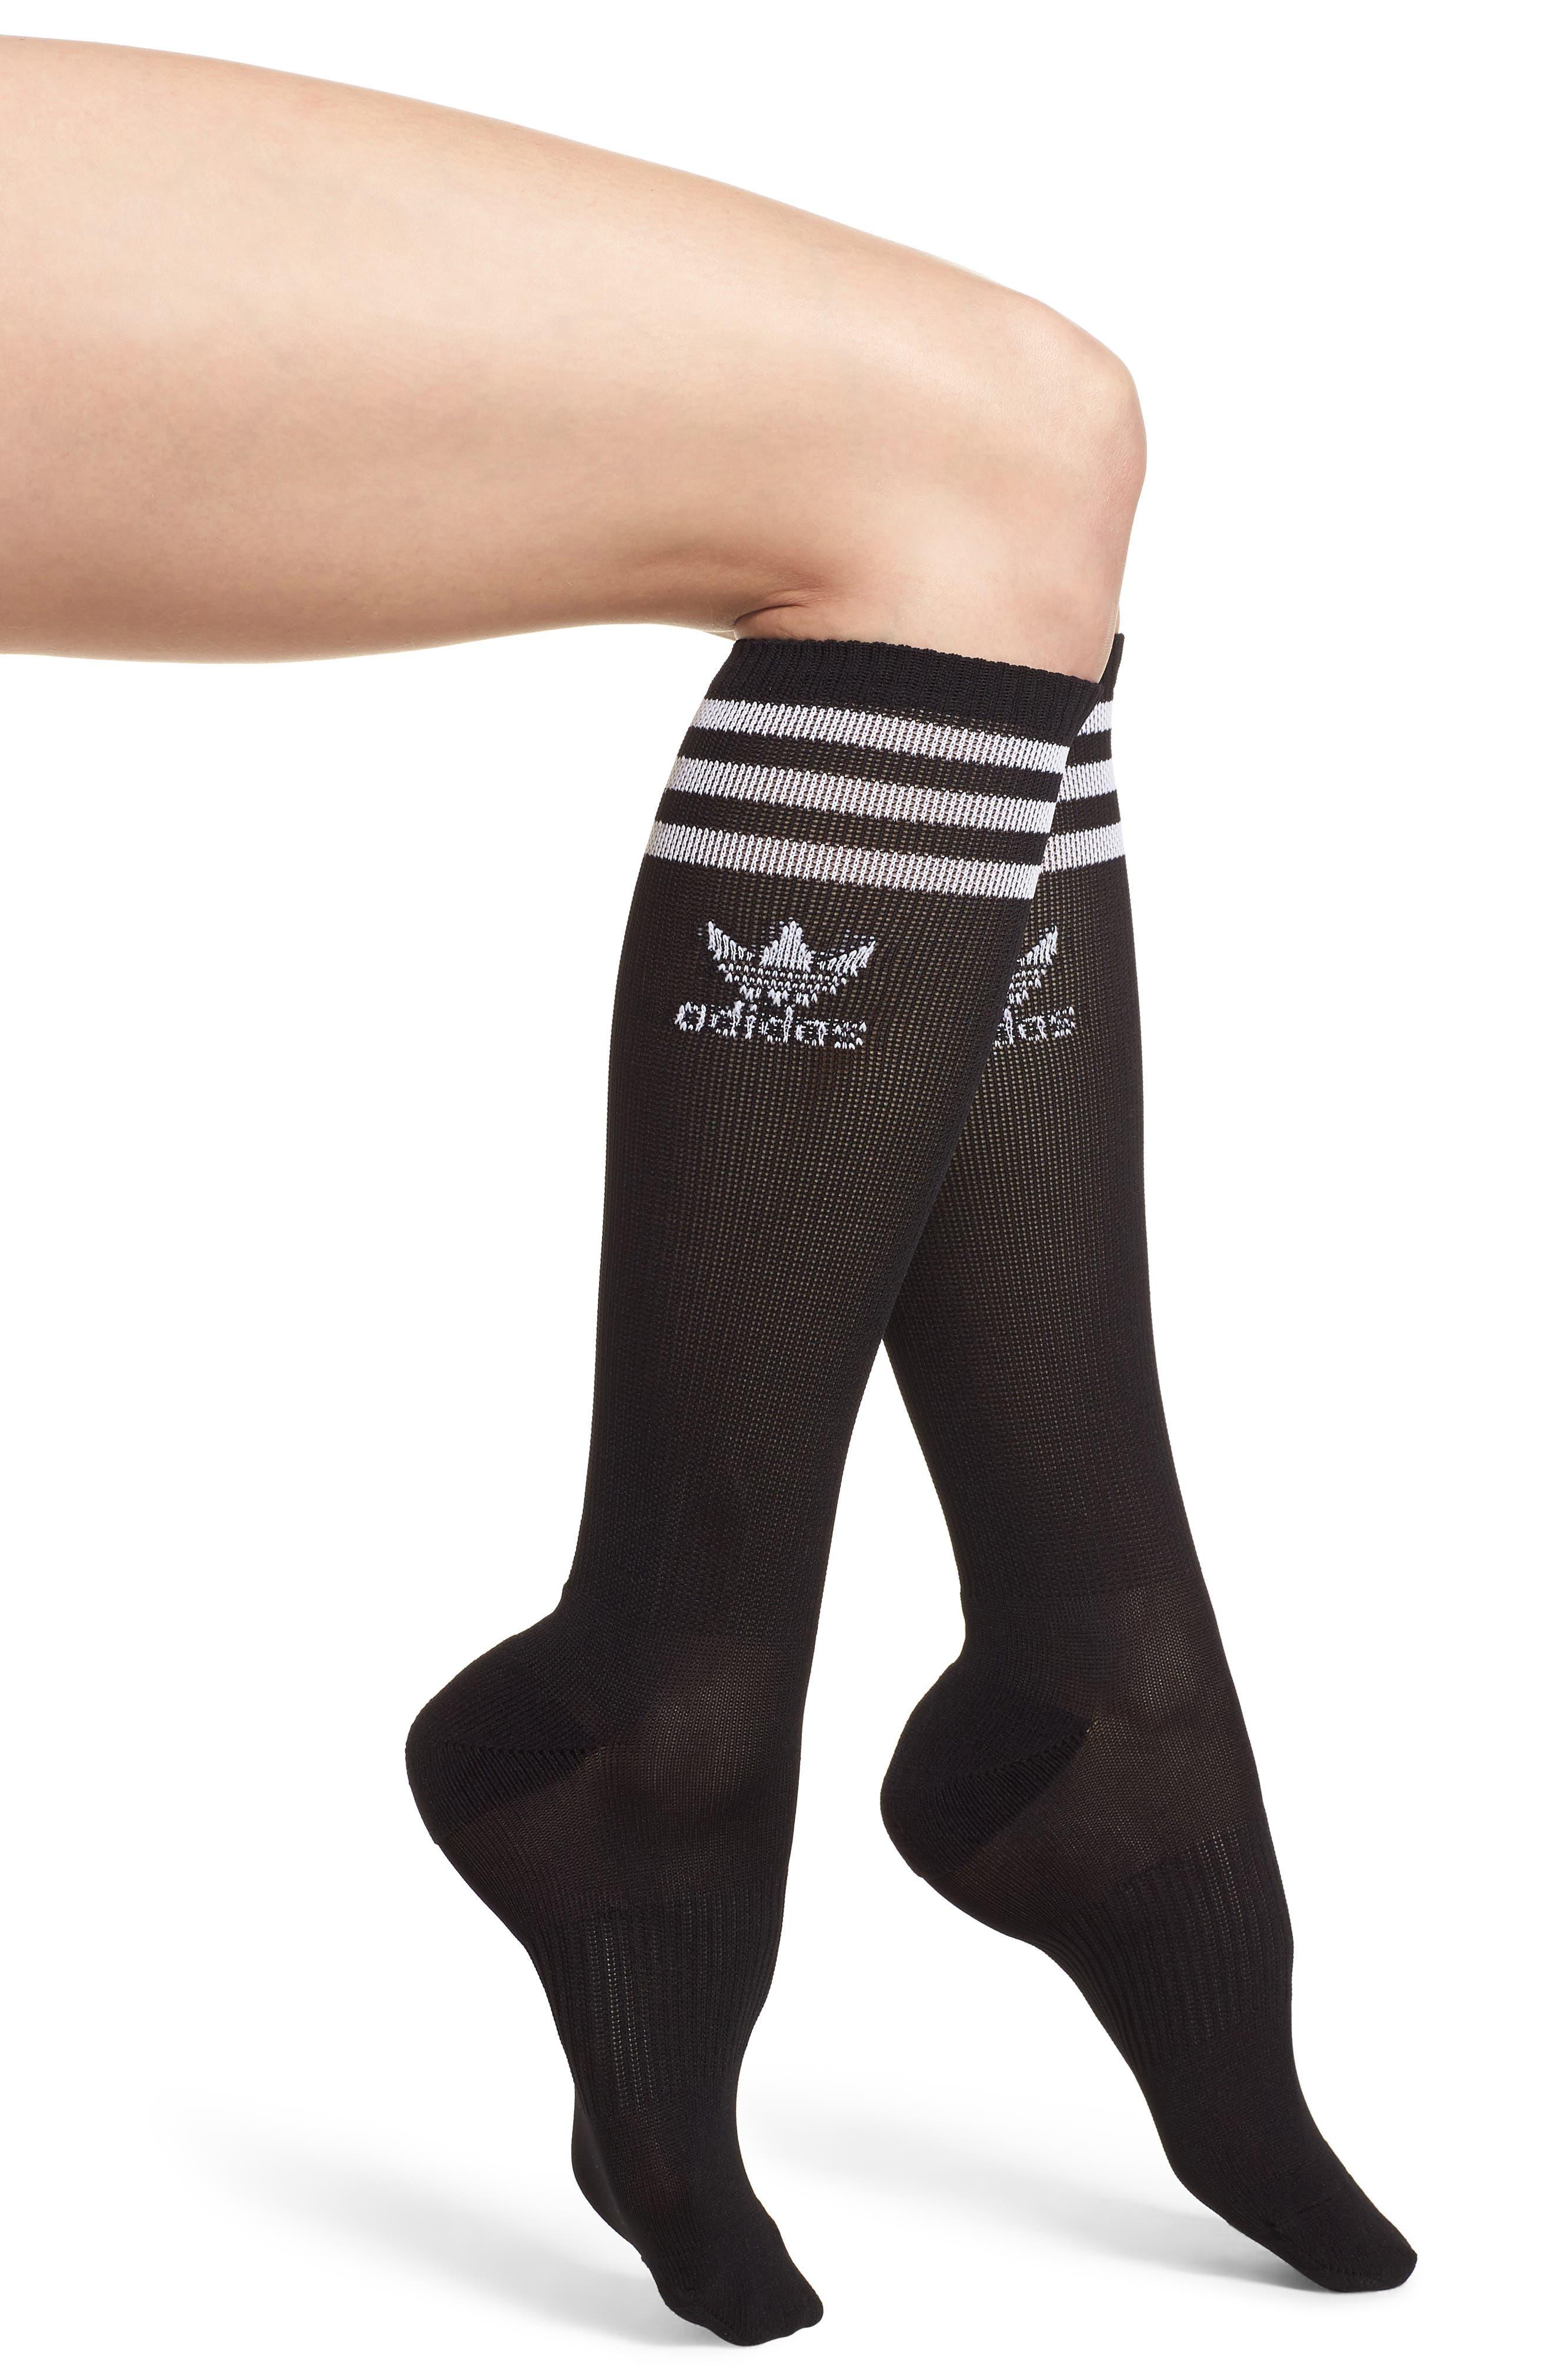 Roller Knee High Socks,                             Main thumbnail 1, color,                             001